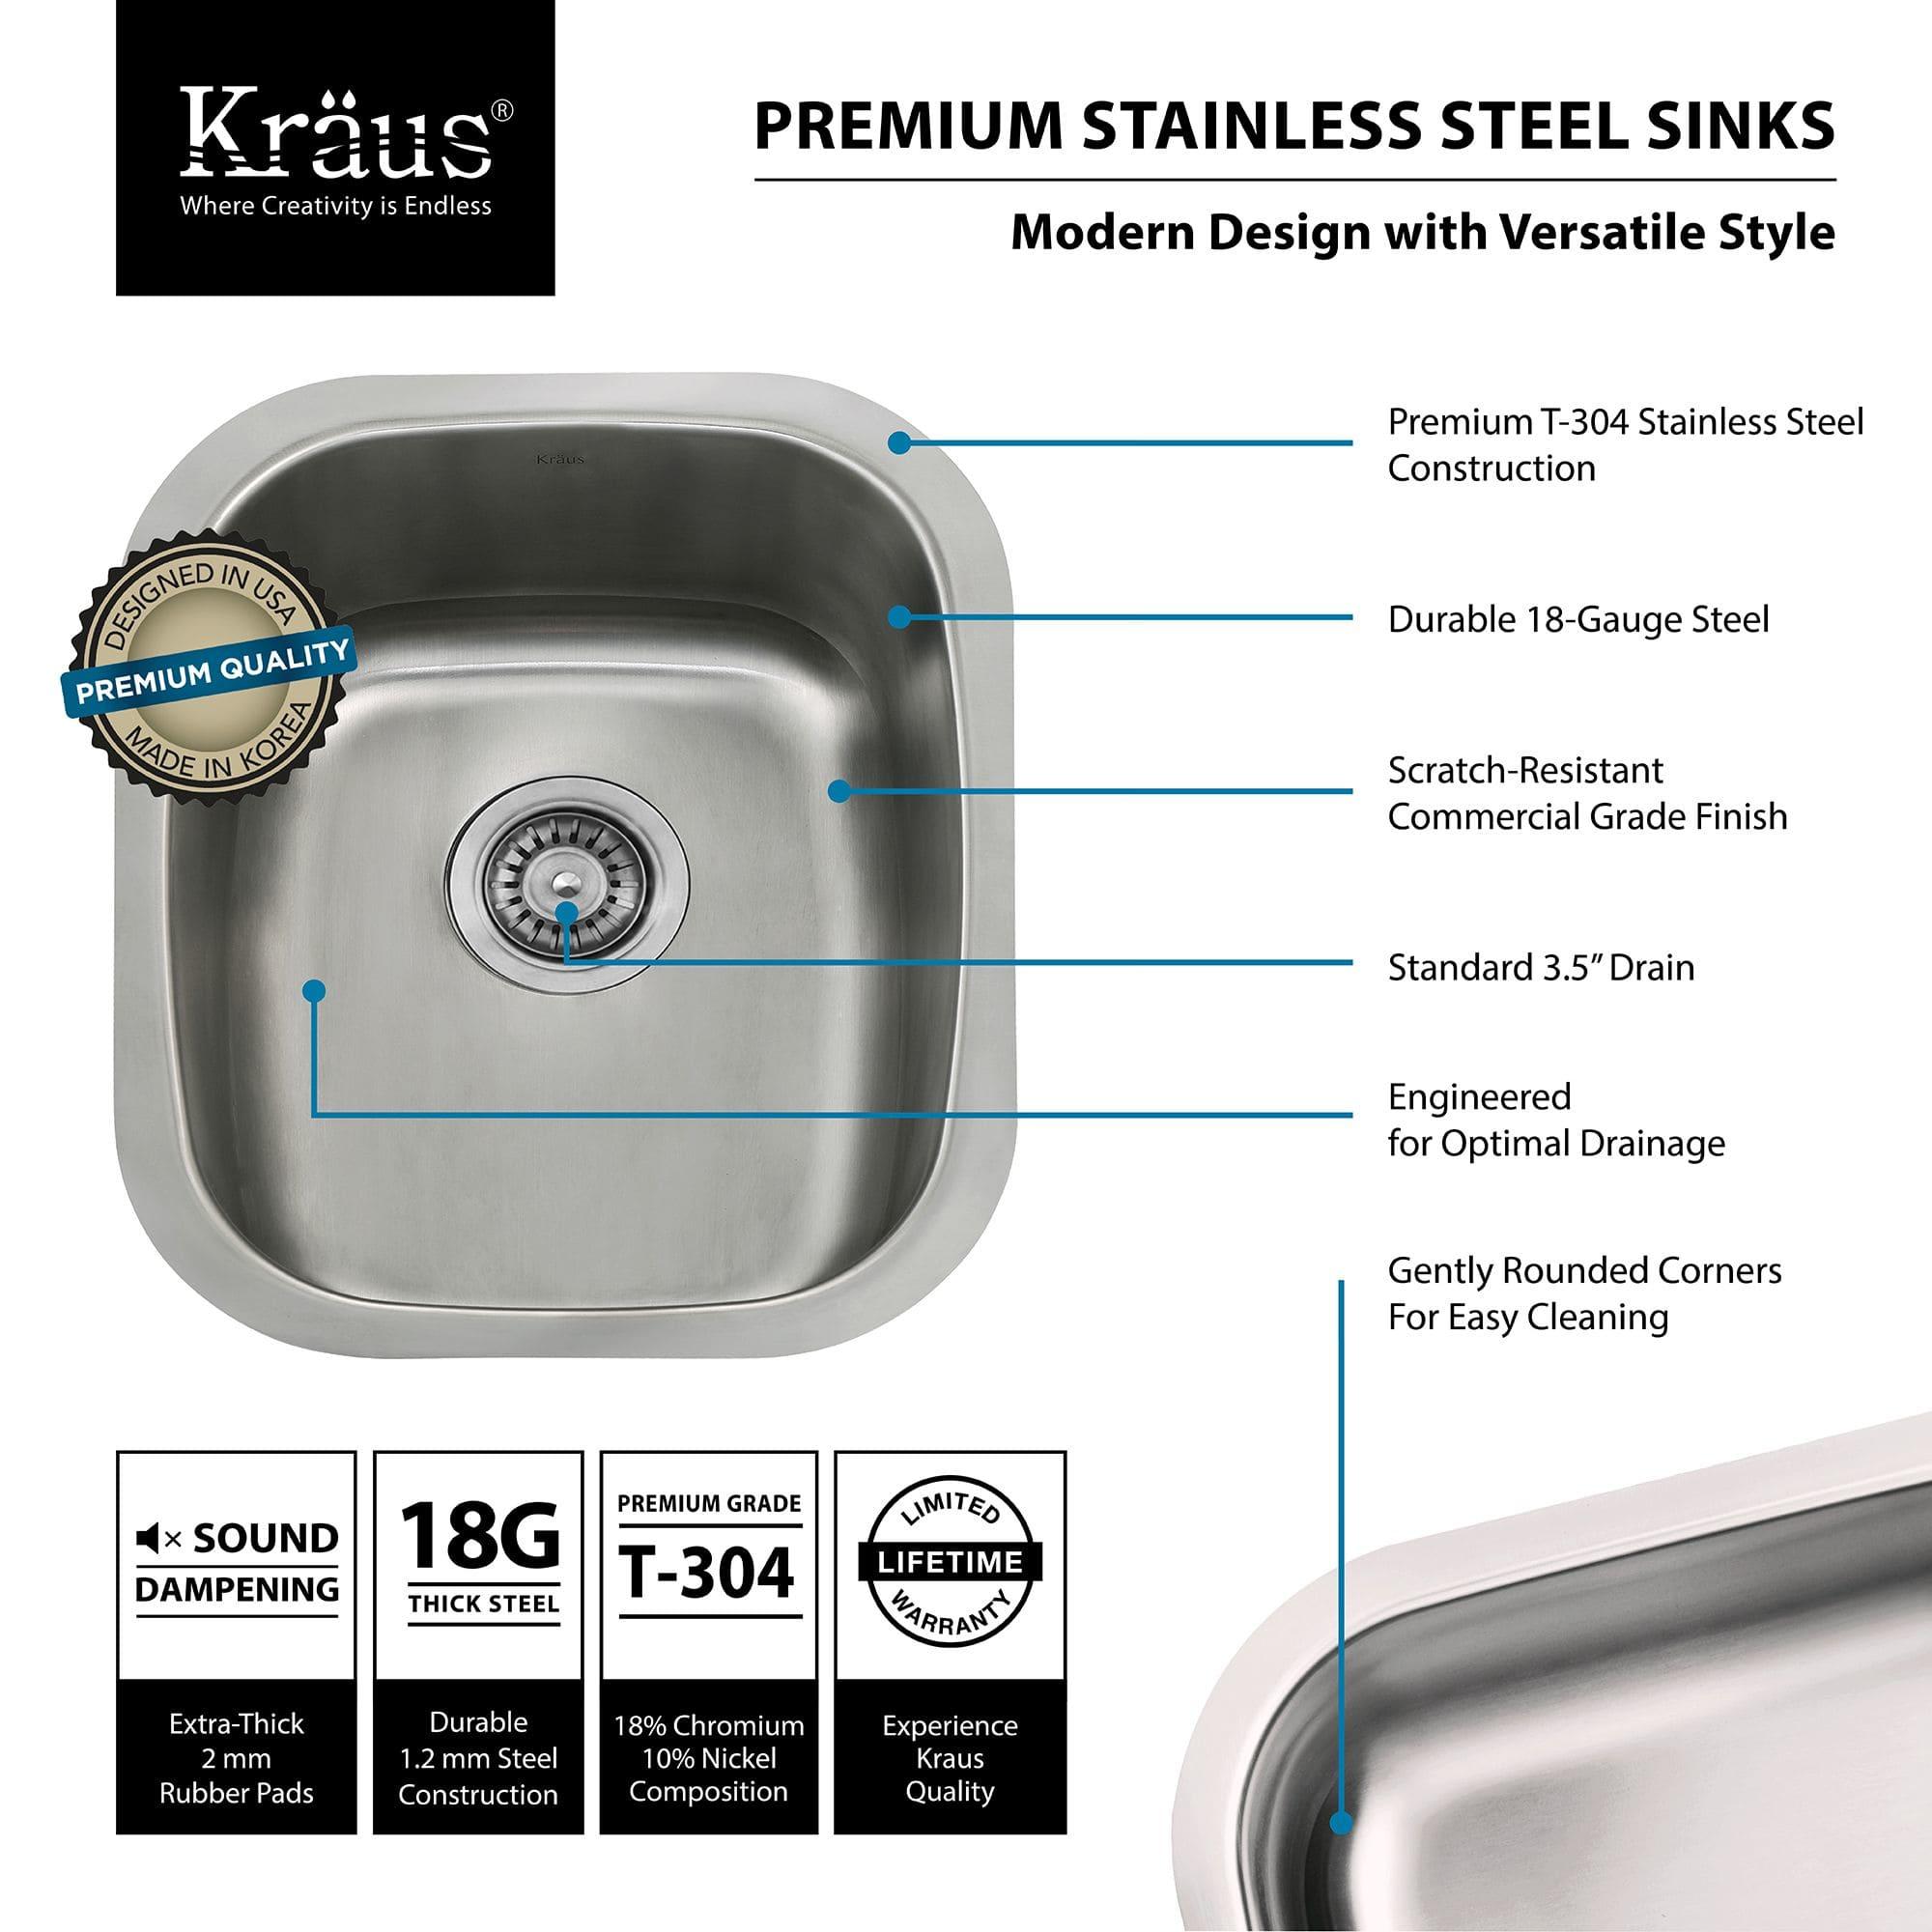 Kitchen Sink Specifications Kraus kbu16 stainless steel 15 undermount single bowl 18 gauge kraus kbu16 stainless steel 15 undermount single bowl 18 gauge stainless steel kitchen sink faucet workwithnaturefo